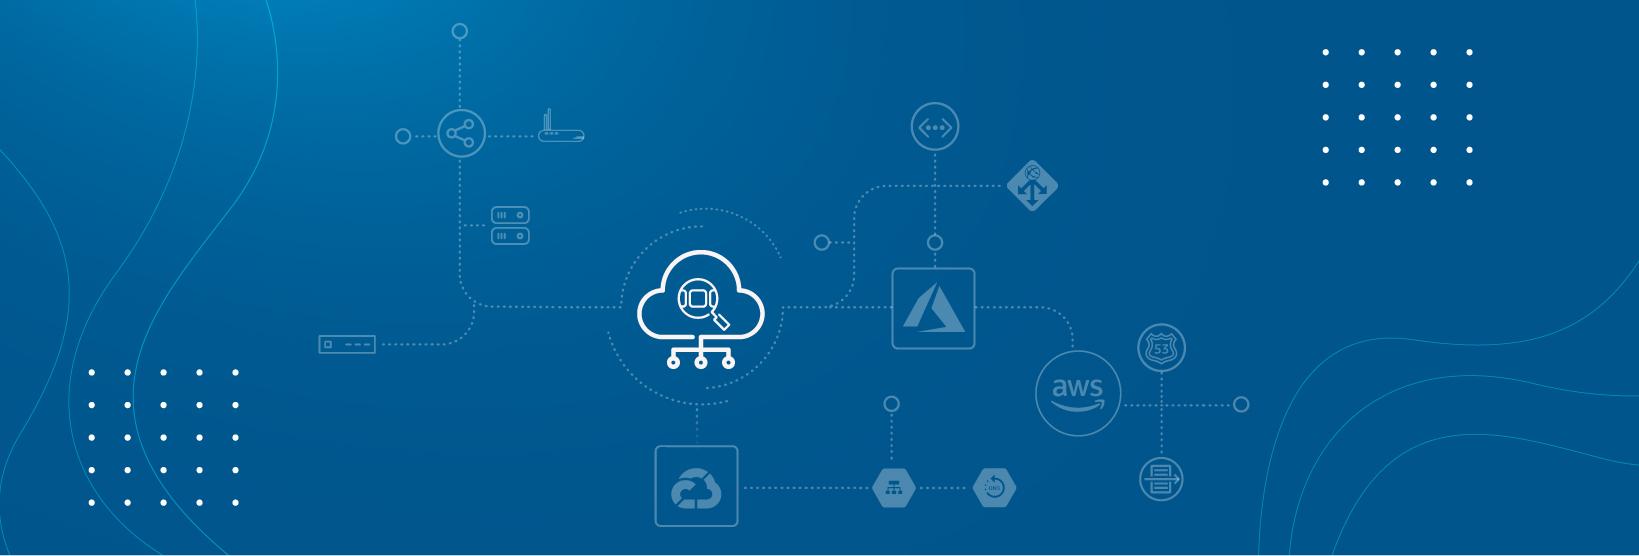 OpsRampによるネットワーク監視